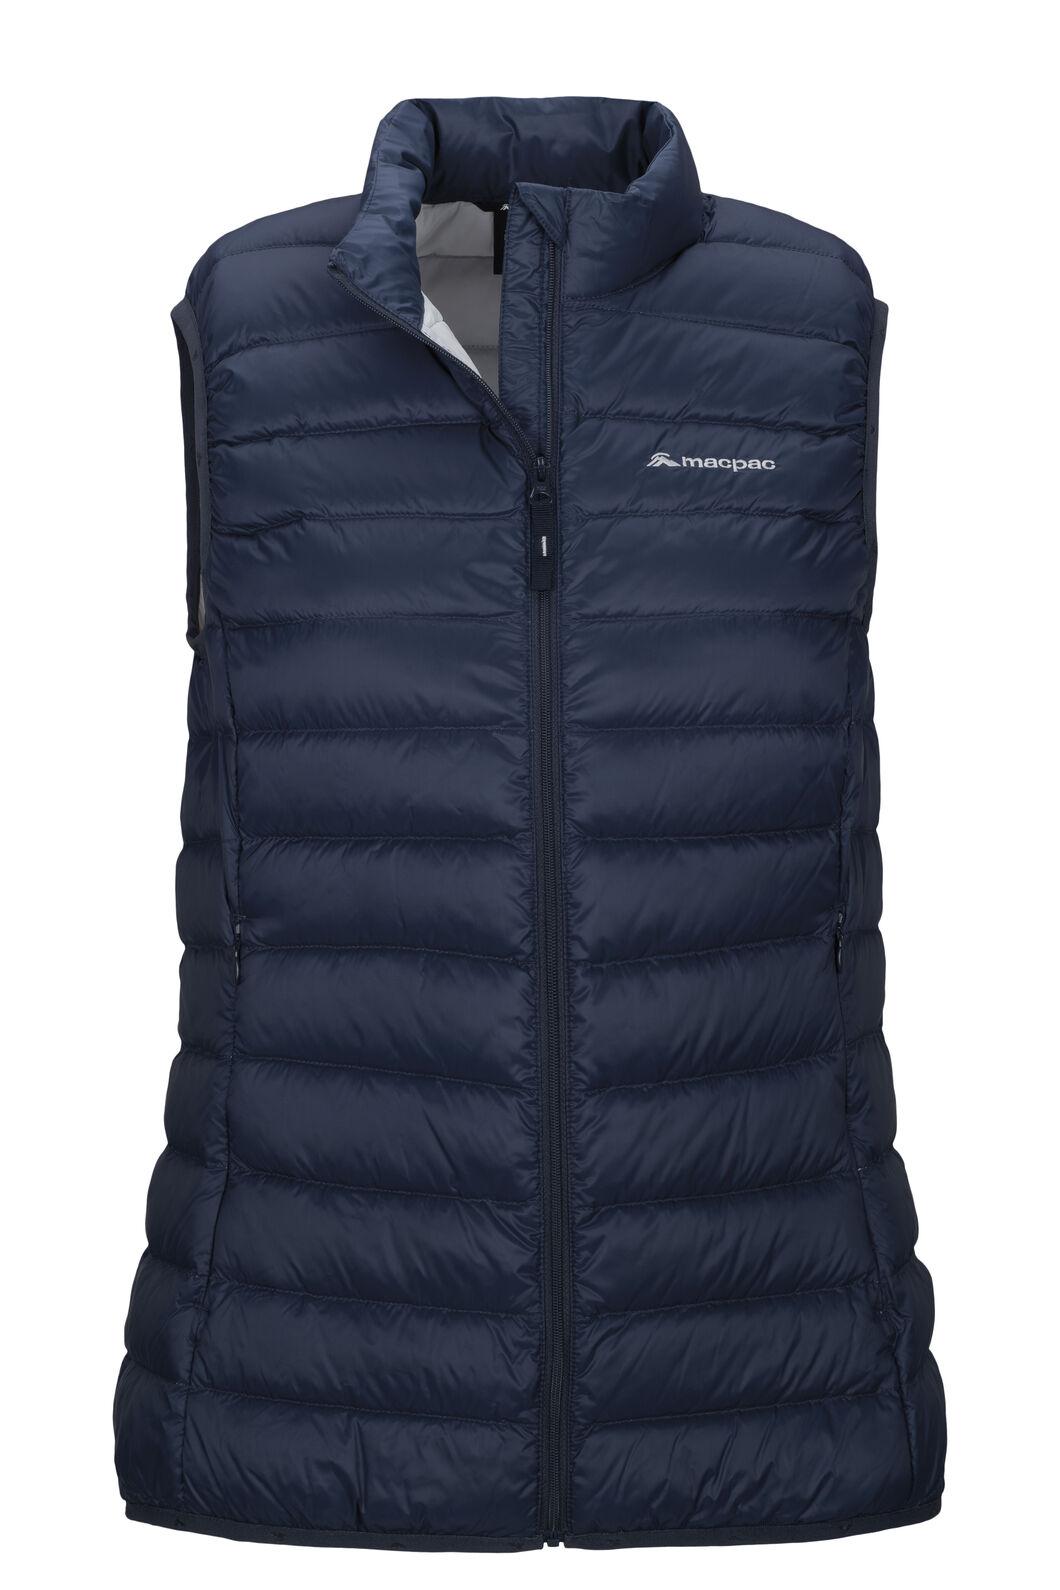 Macpac Uber Light Down Vest — Women's, Black Iris/Glacier Grey, hi-res